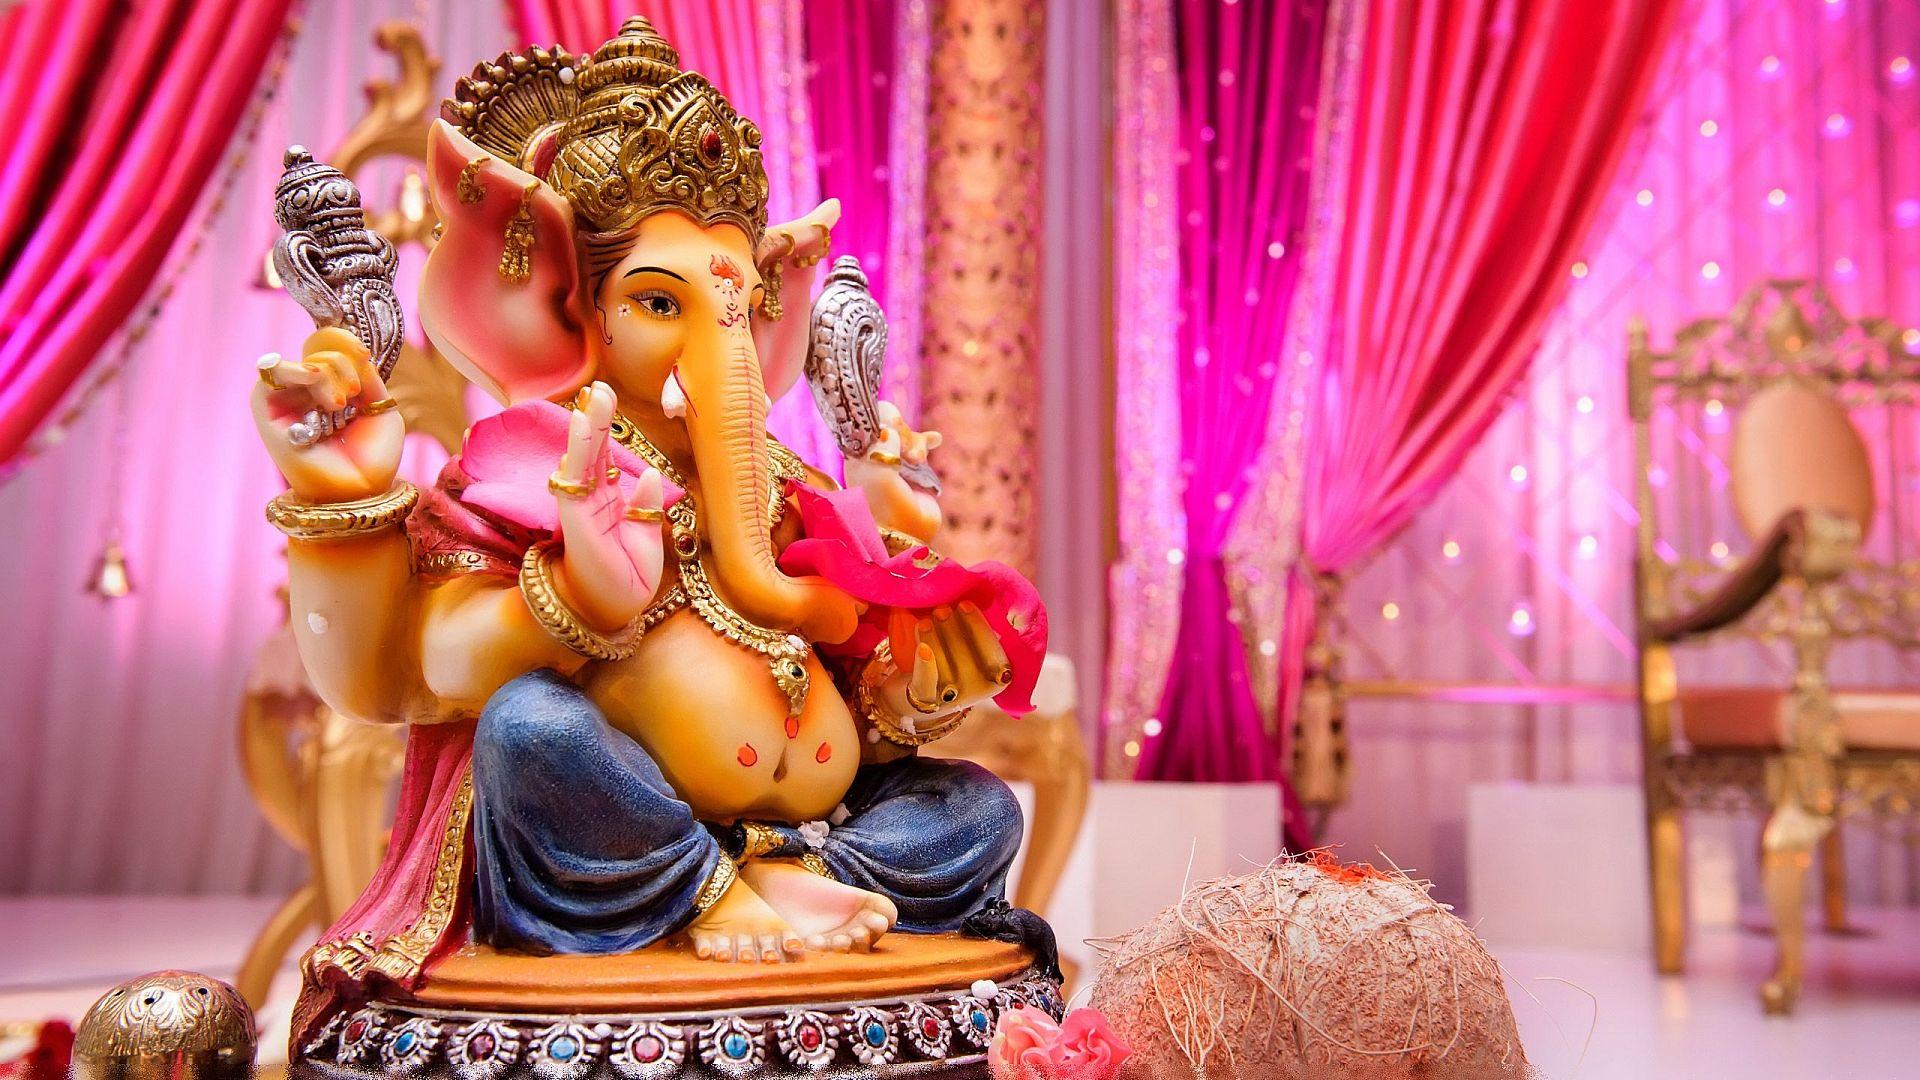 Www Hindu God Wallpaper Com Cute Ganeshji Lord Ganesha God Hd Wallpapers